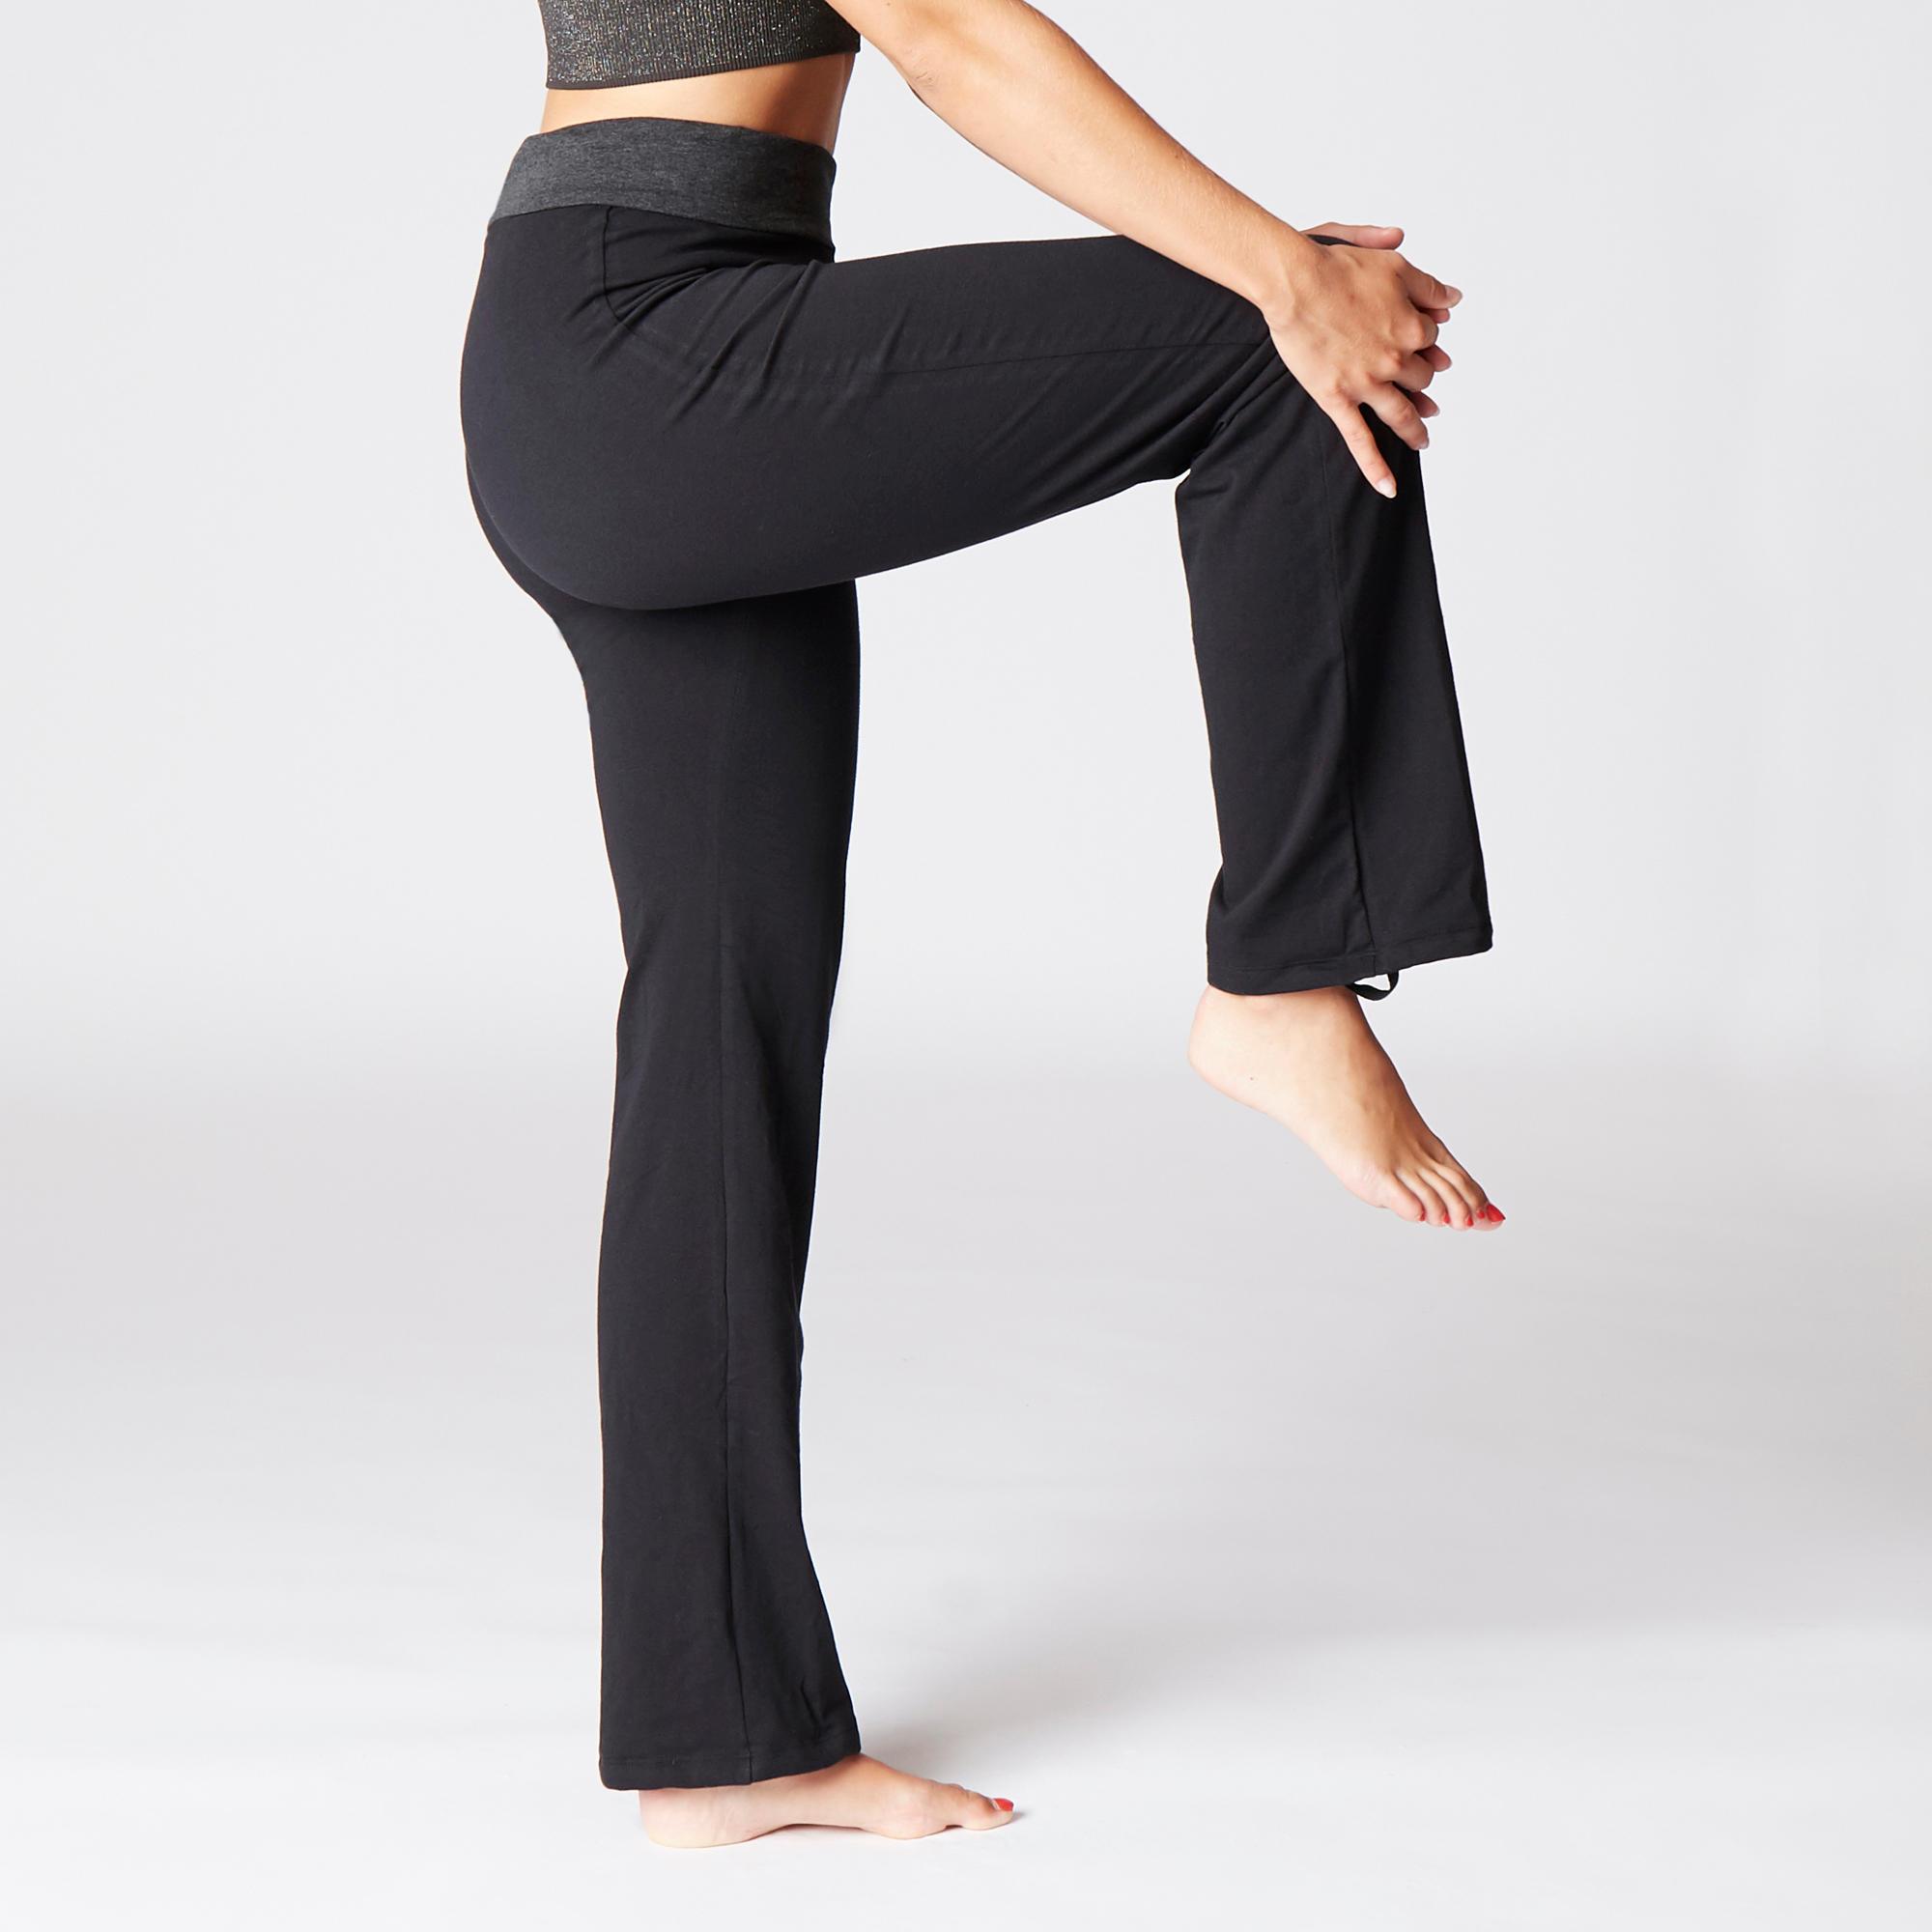 Women's Organic Cotton Gentle Yoga Bottoms - Black/Grey